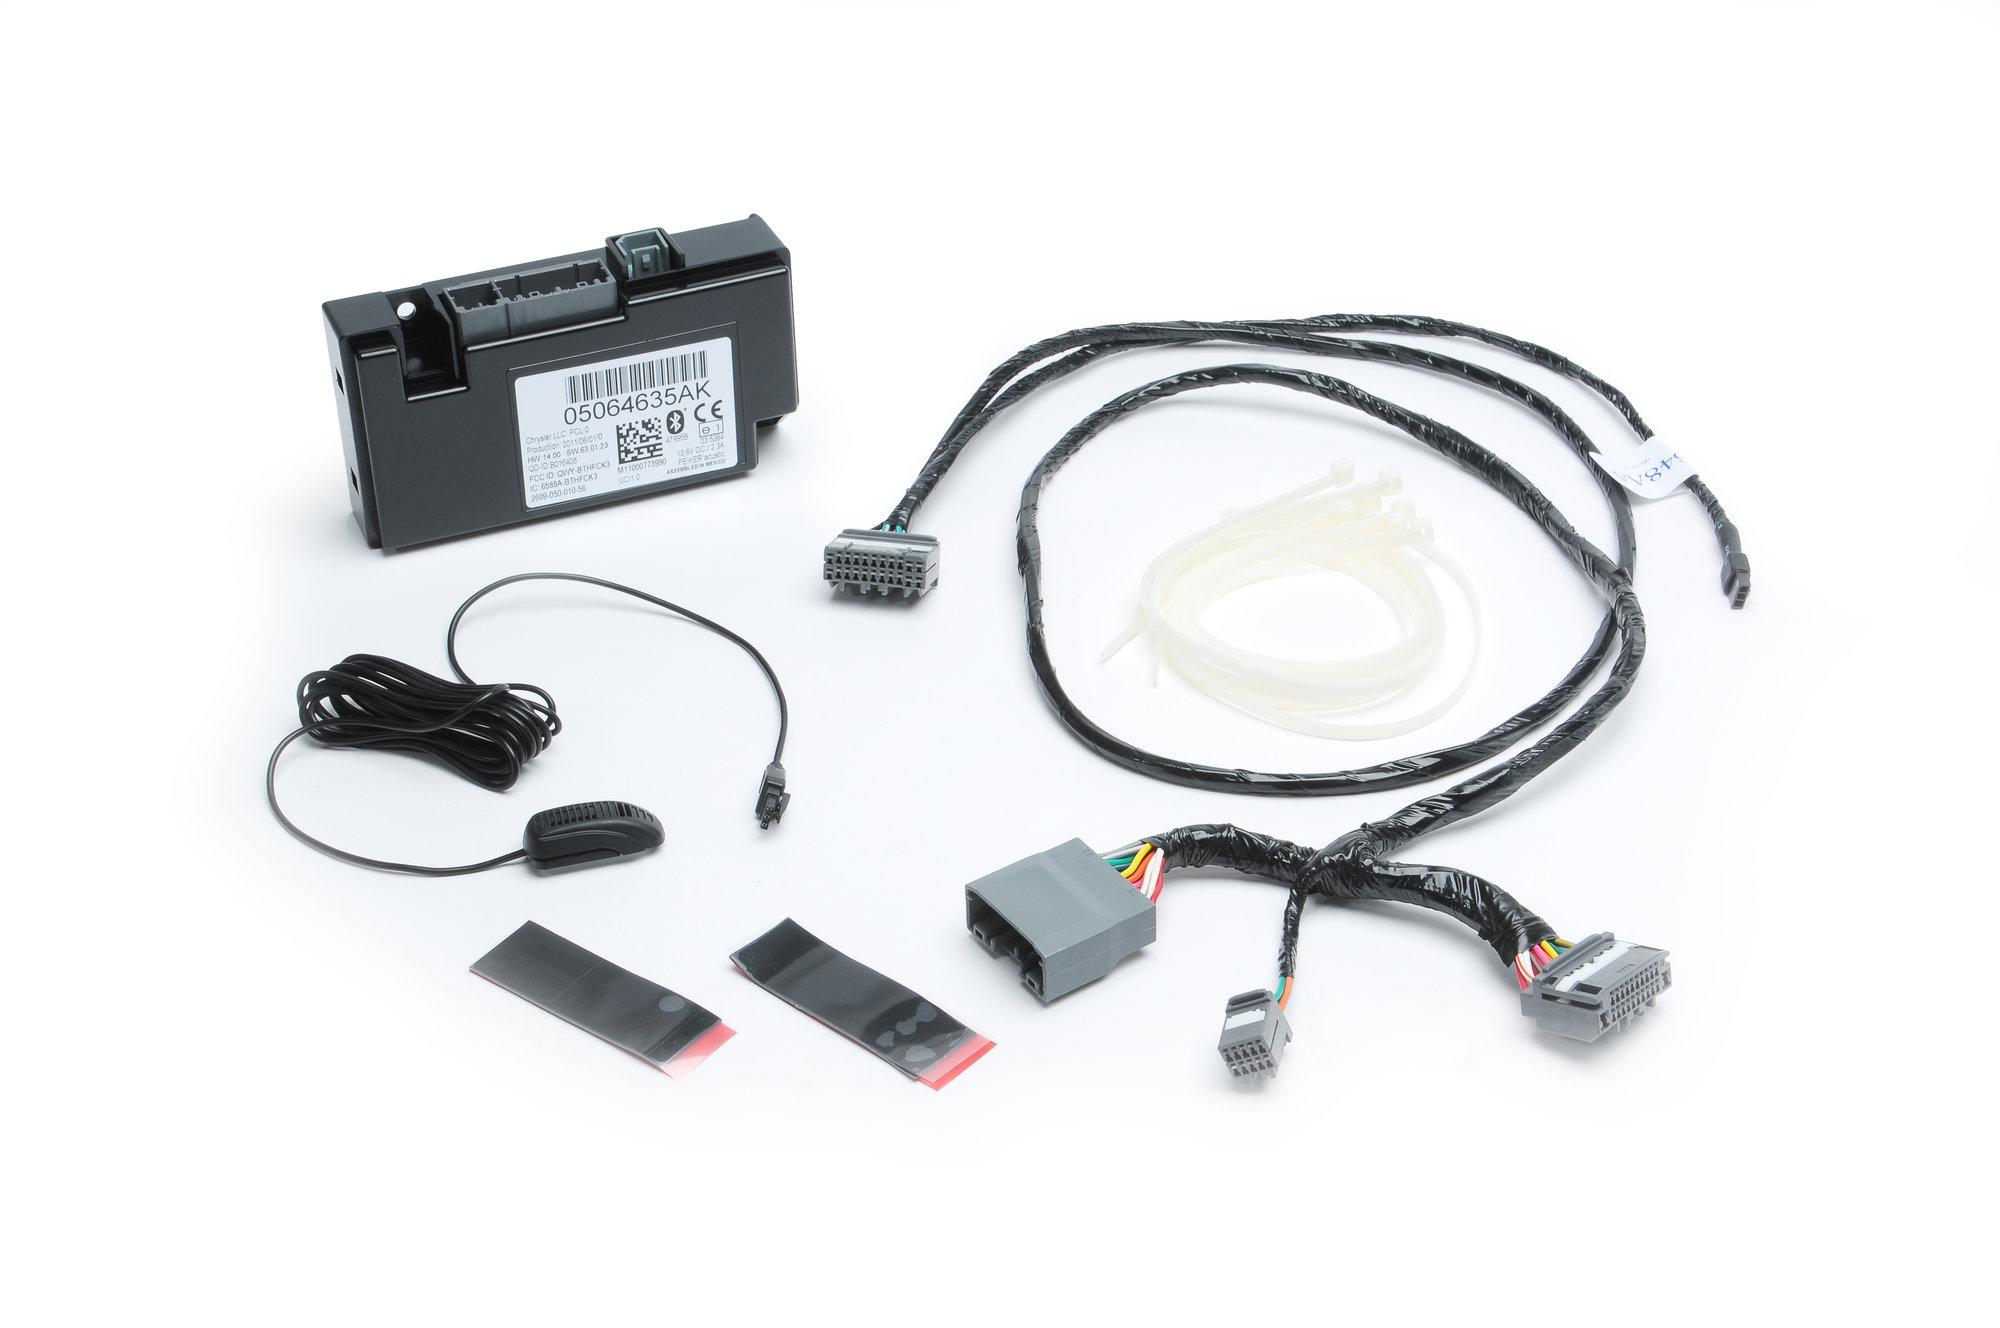 2010 jeep wrangler radio wiring diagram cinderella venn compare contrast mopar 82212159 uconnect phone kit with ipod integration for 07-12 jk, grand ...